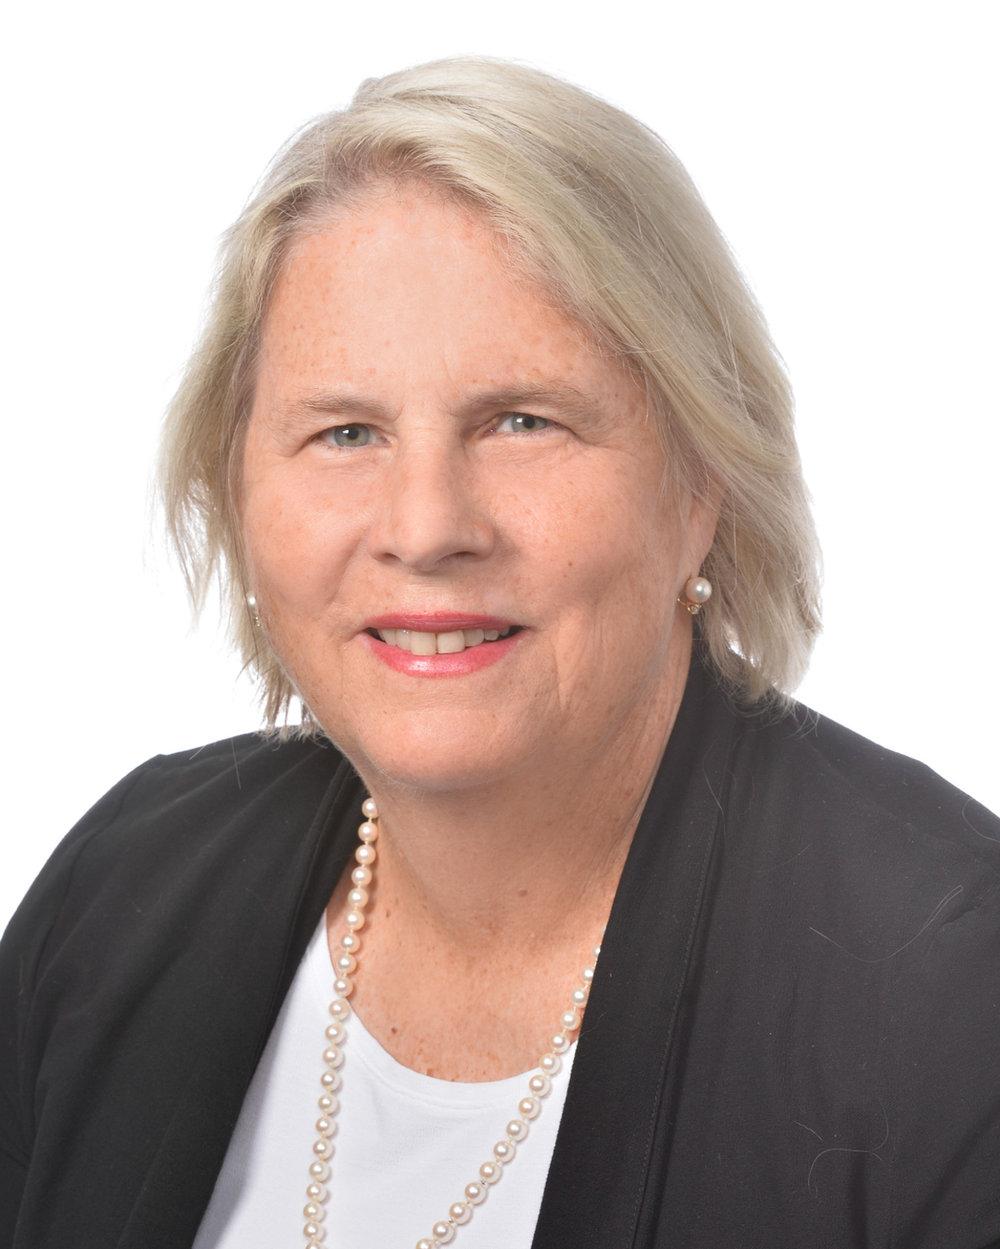 Kathryn M. Kunz - Director